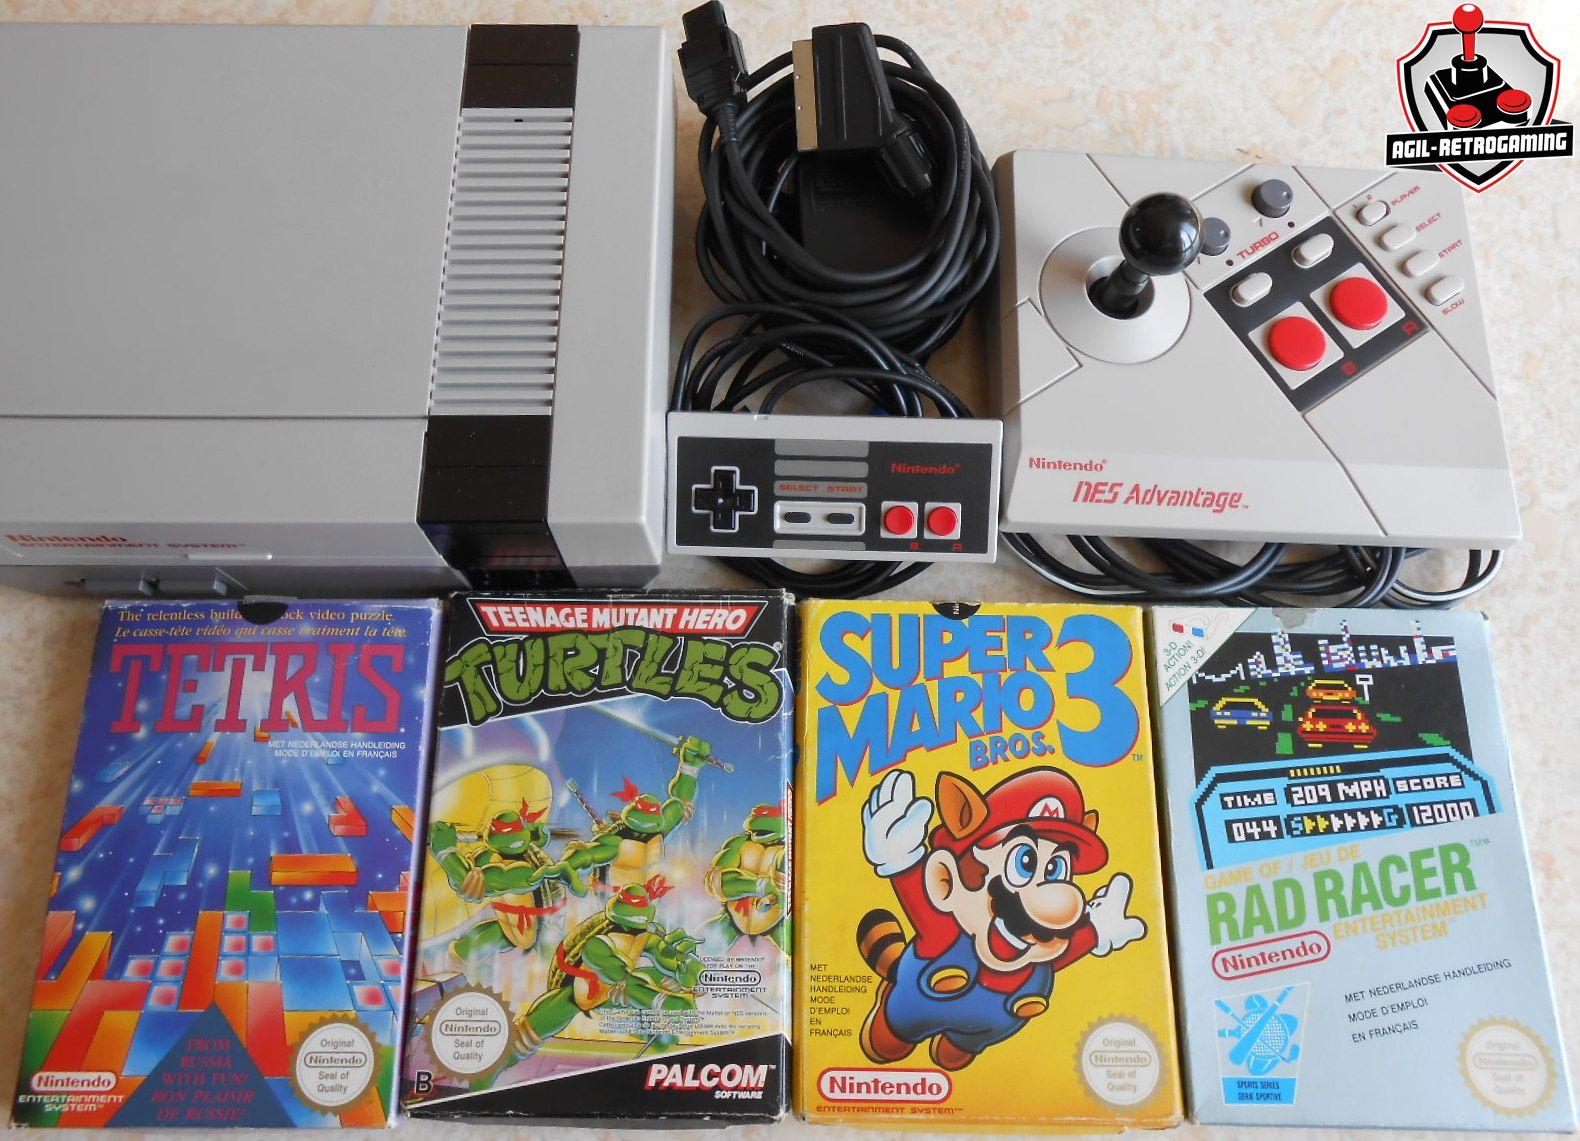 Nintendo - NES : Tetris / TMNT / Super Mario Bros 3 / Rad Racer